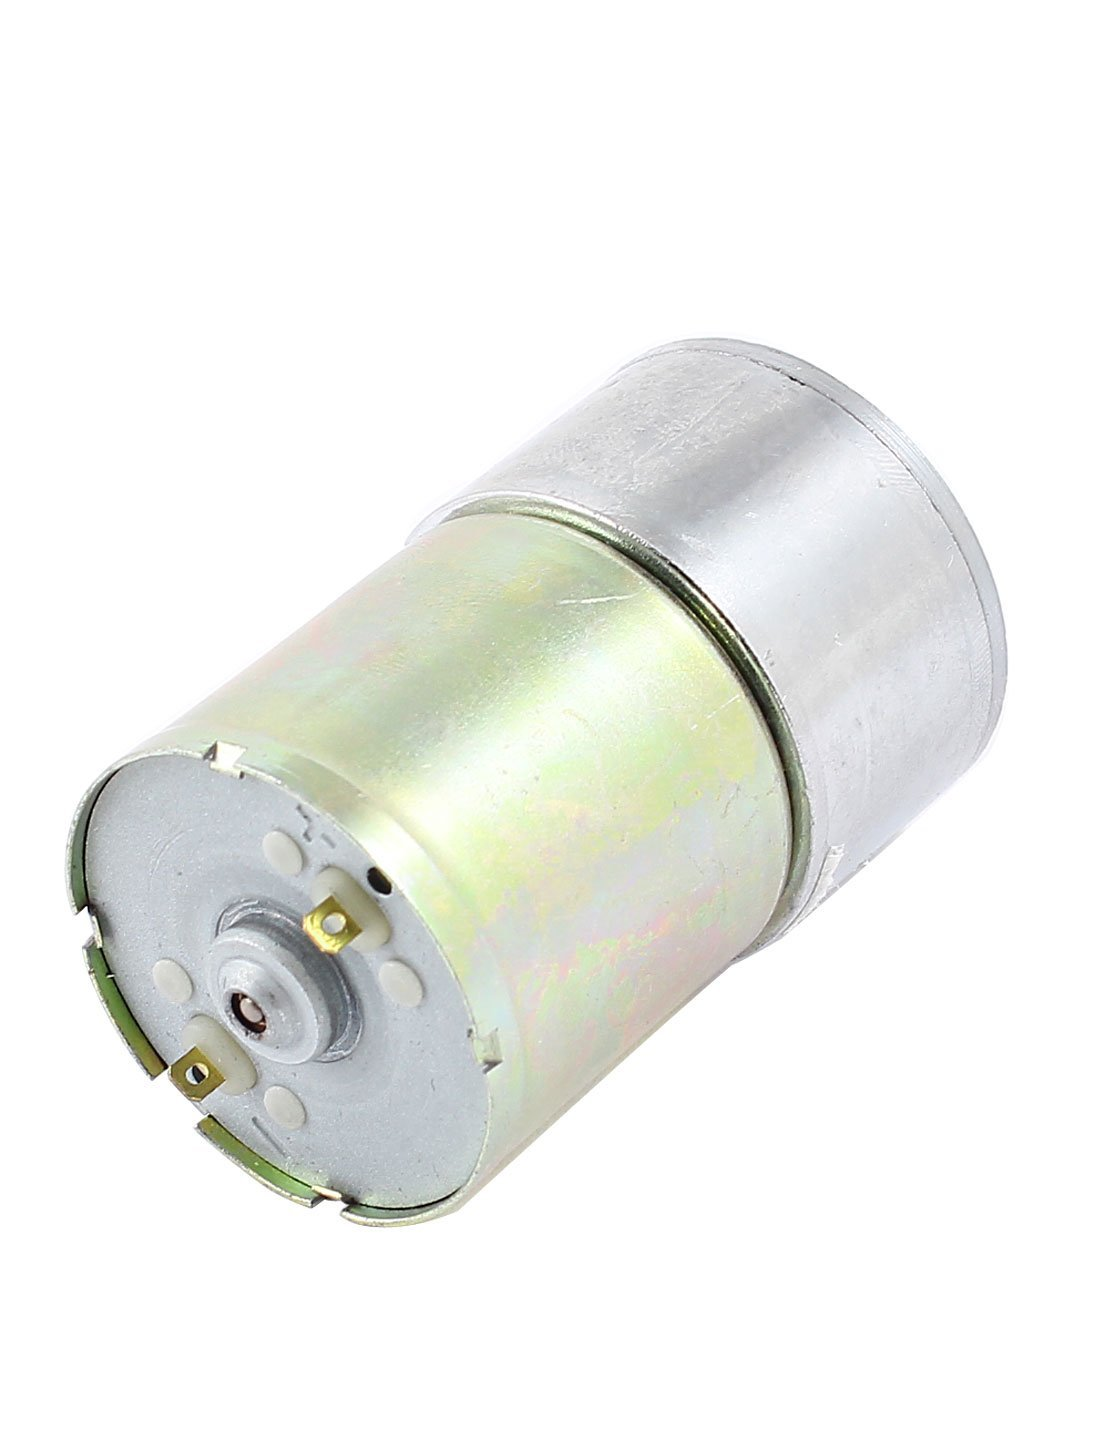 DC 24V 0.33A 37mm Dia vitesse magnétique Geared Motor Box 1000 RPM